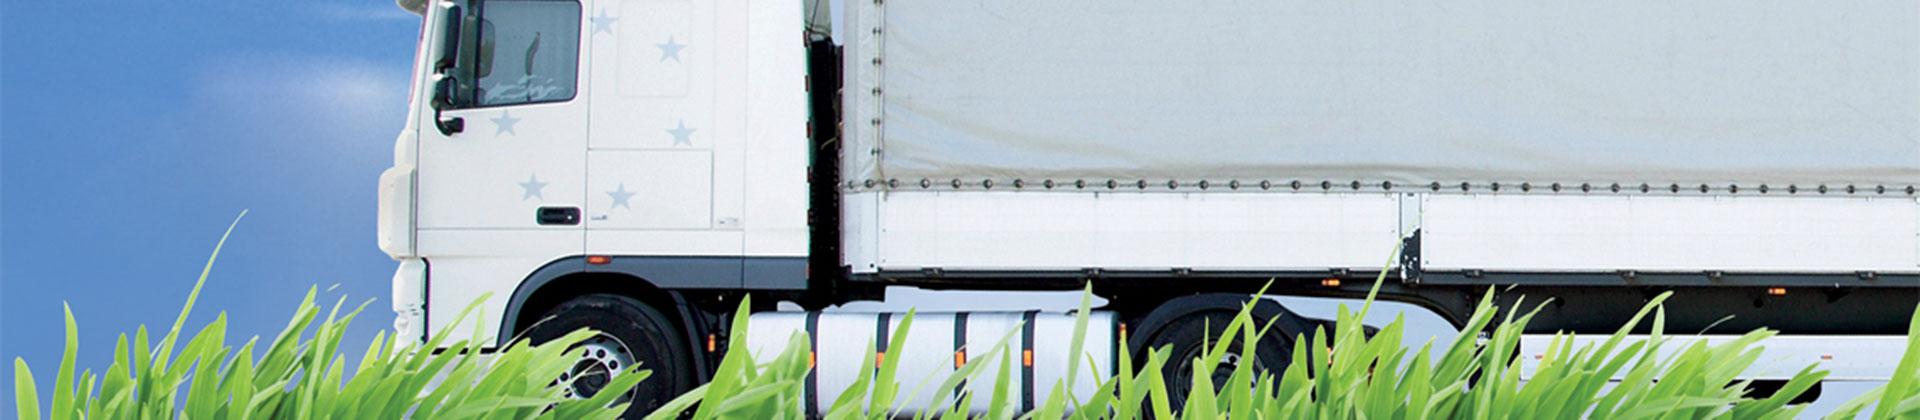 White_truck_grass_04